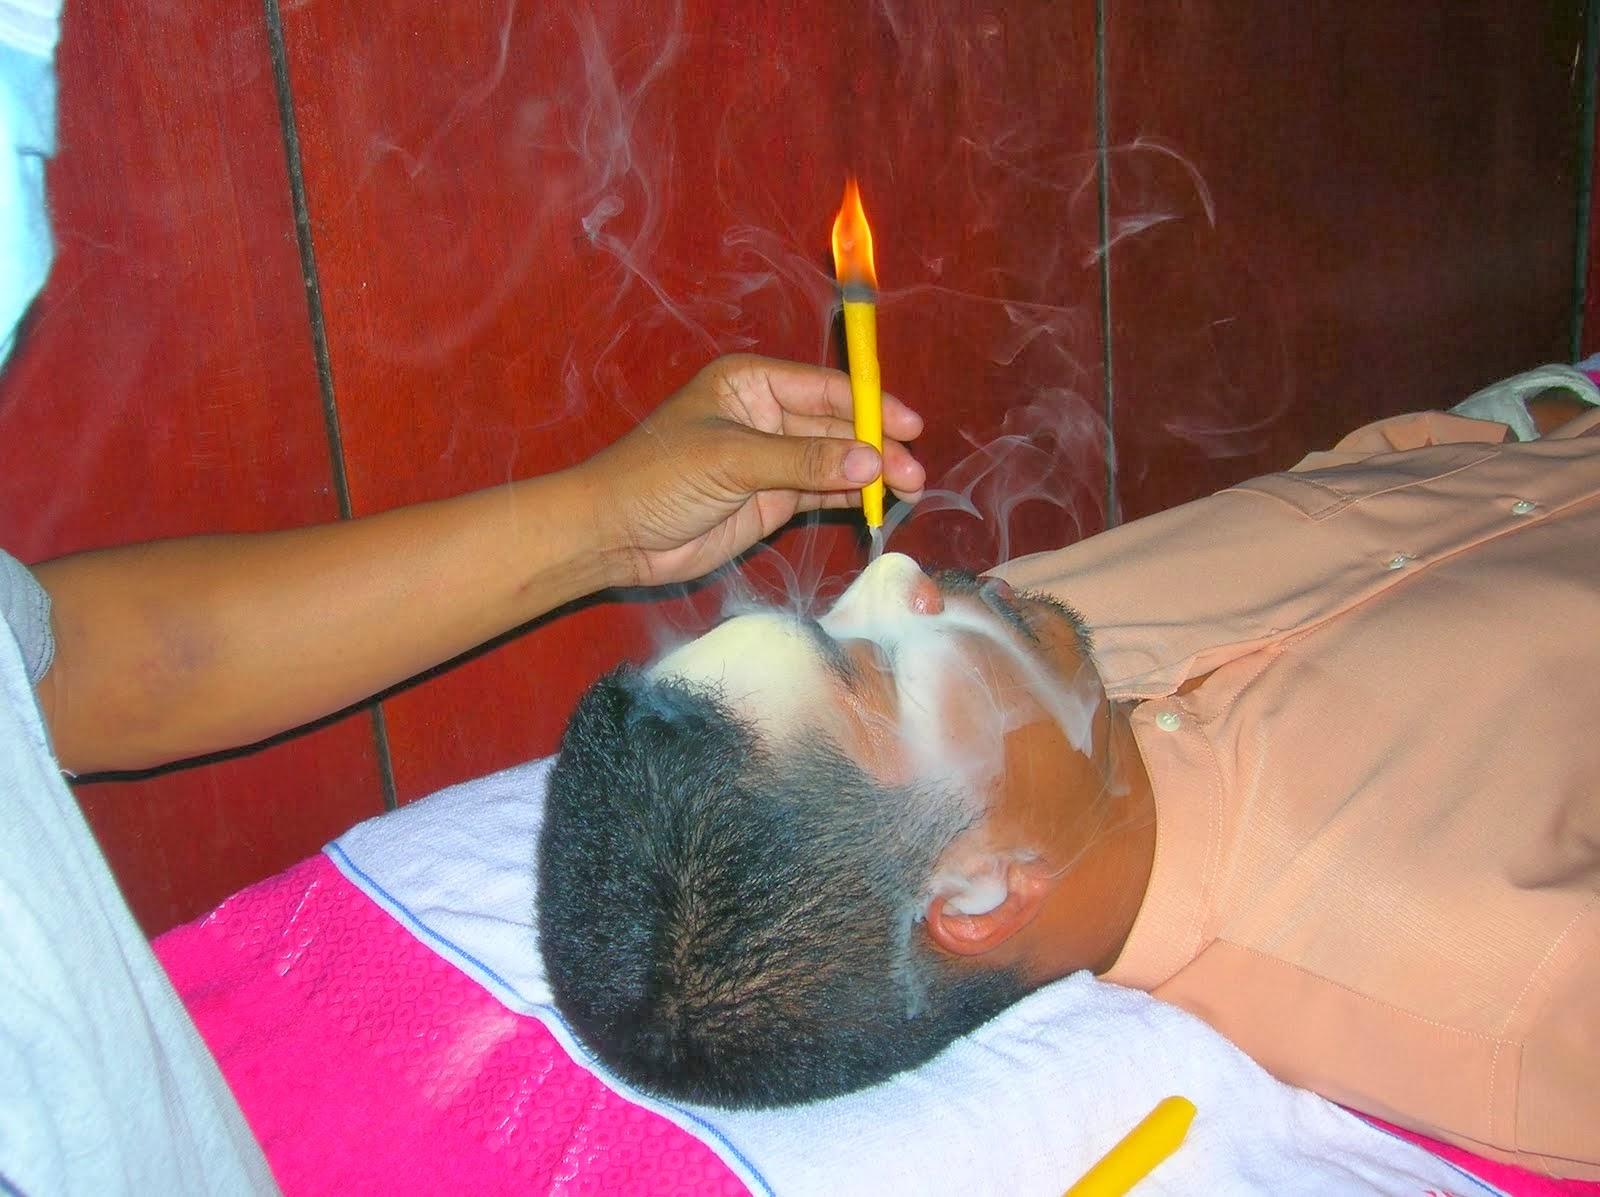 Rawatan Resdung tanpa rokok resdung Pilihan Ayah